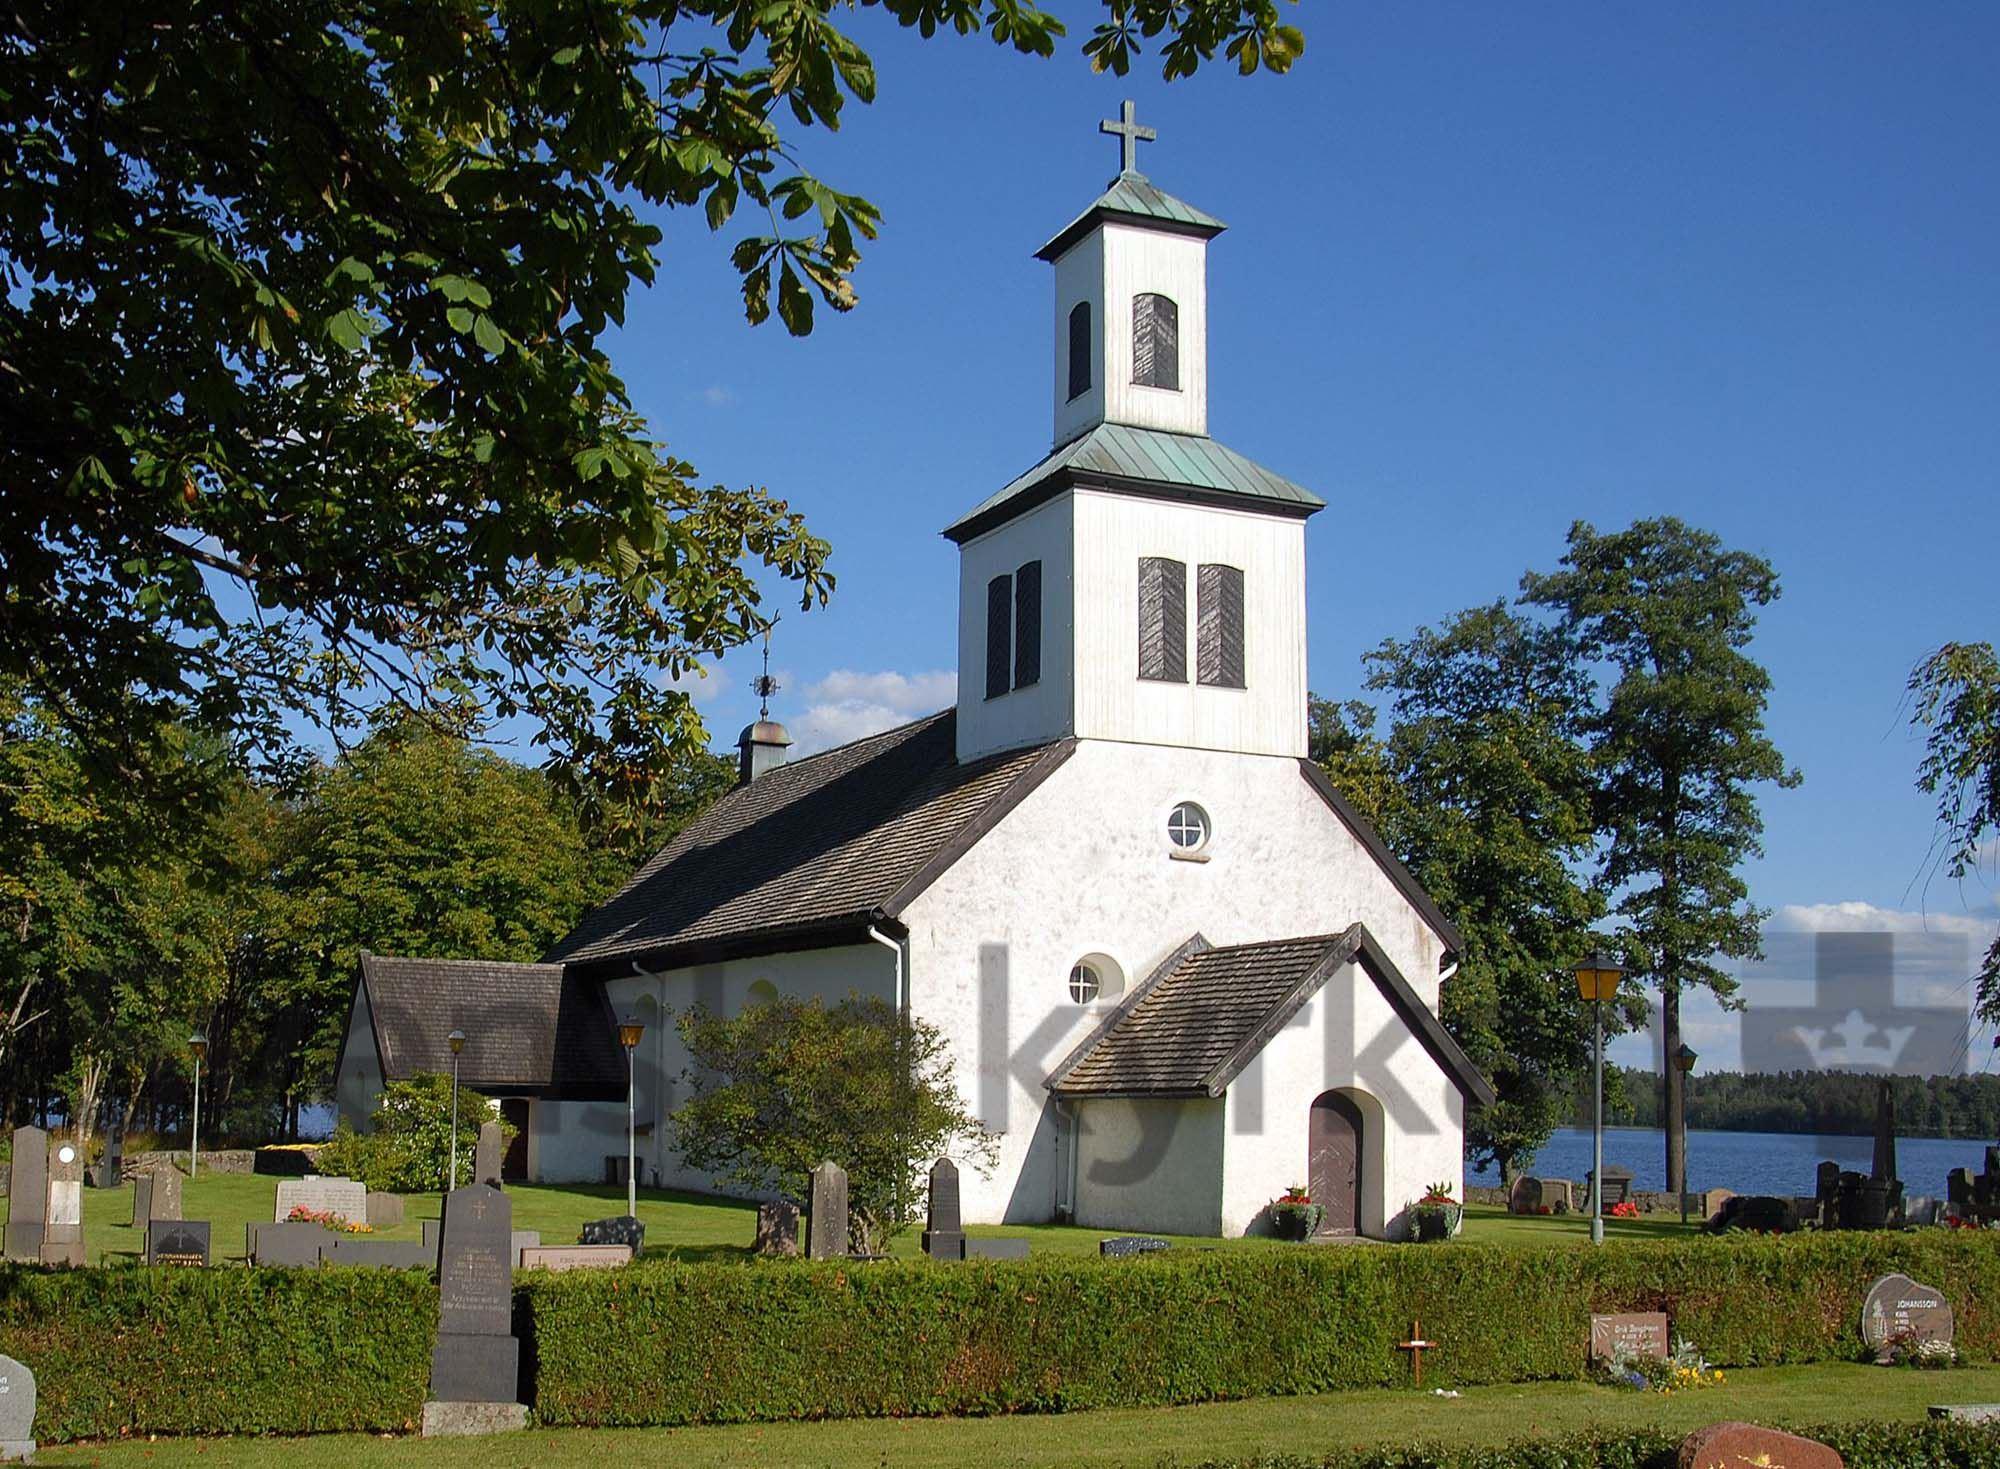 Bengt-Åke Fasth, Odensjö church